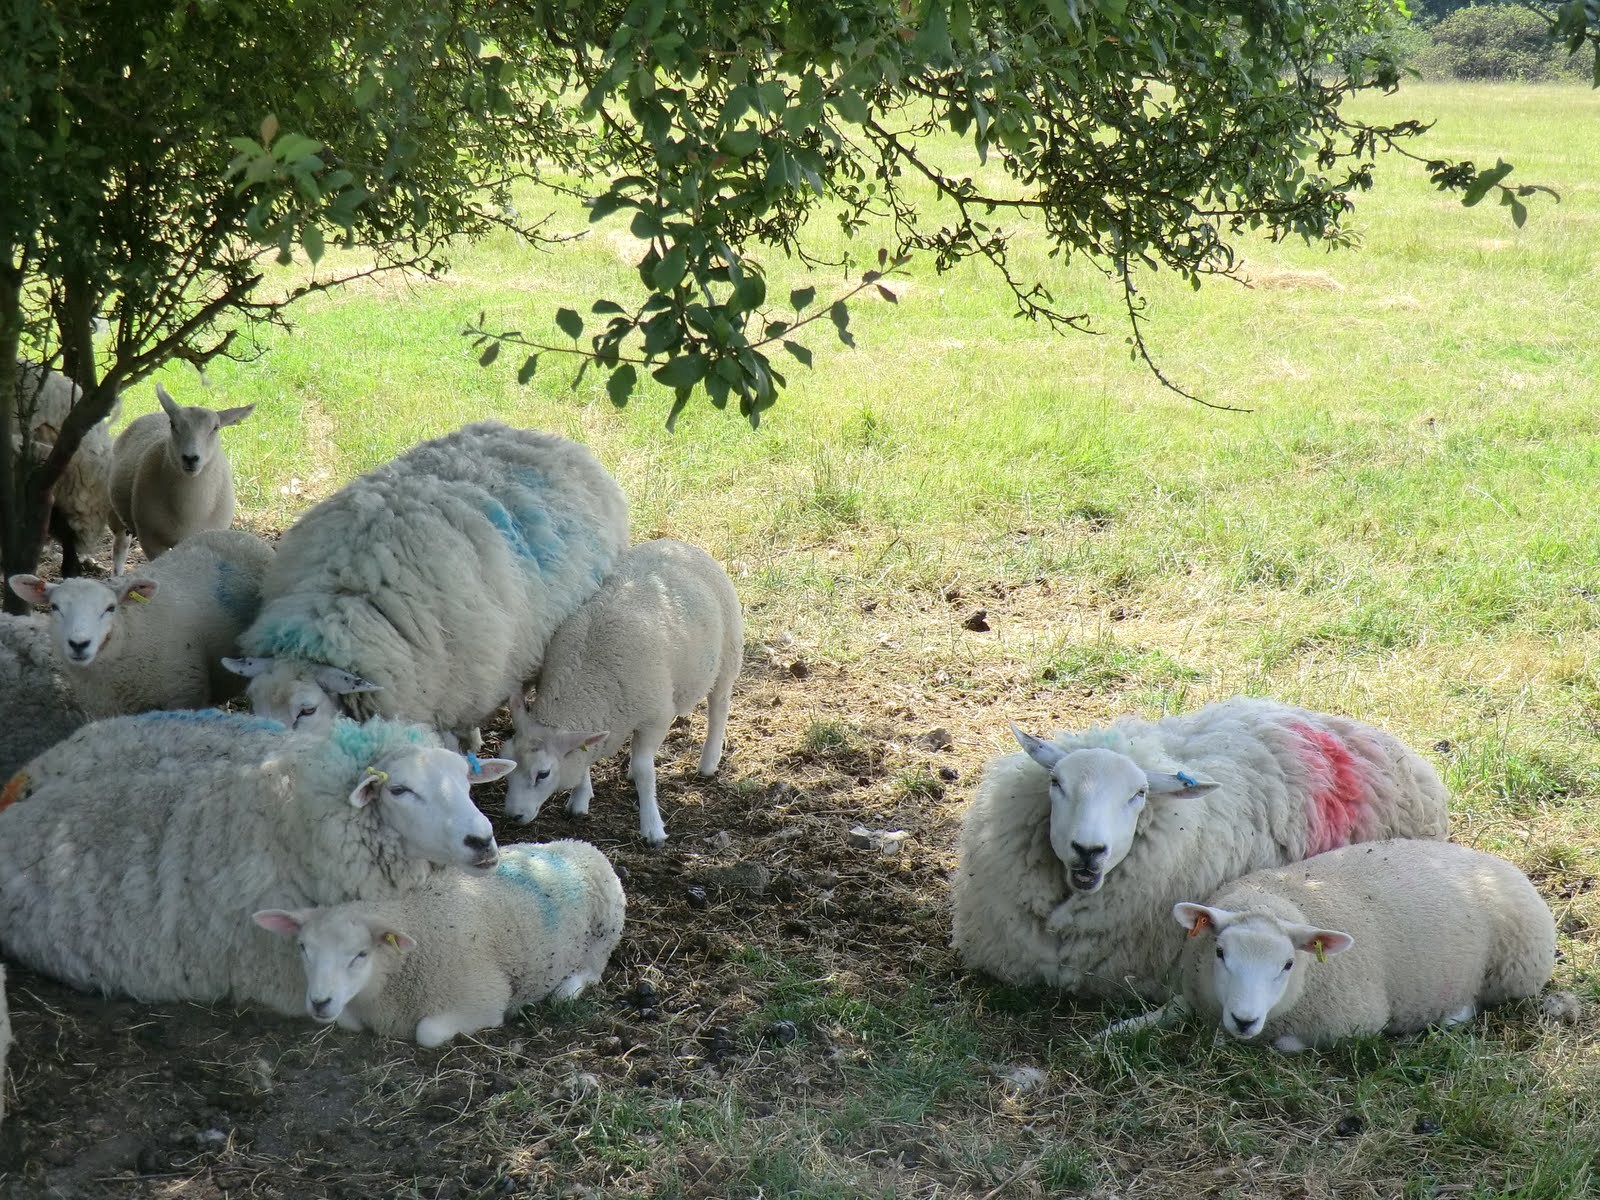 CIMG2340 Sleepy sheep by Whitehall Lane